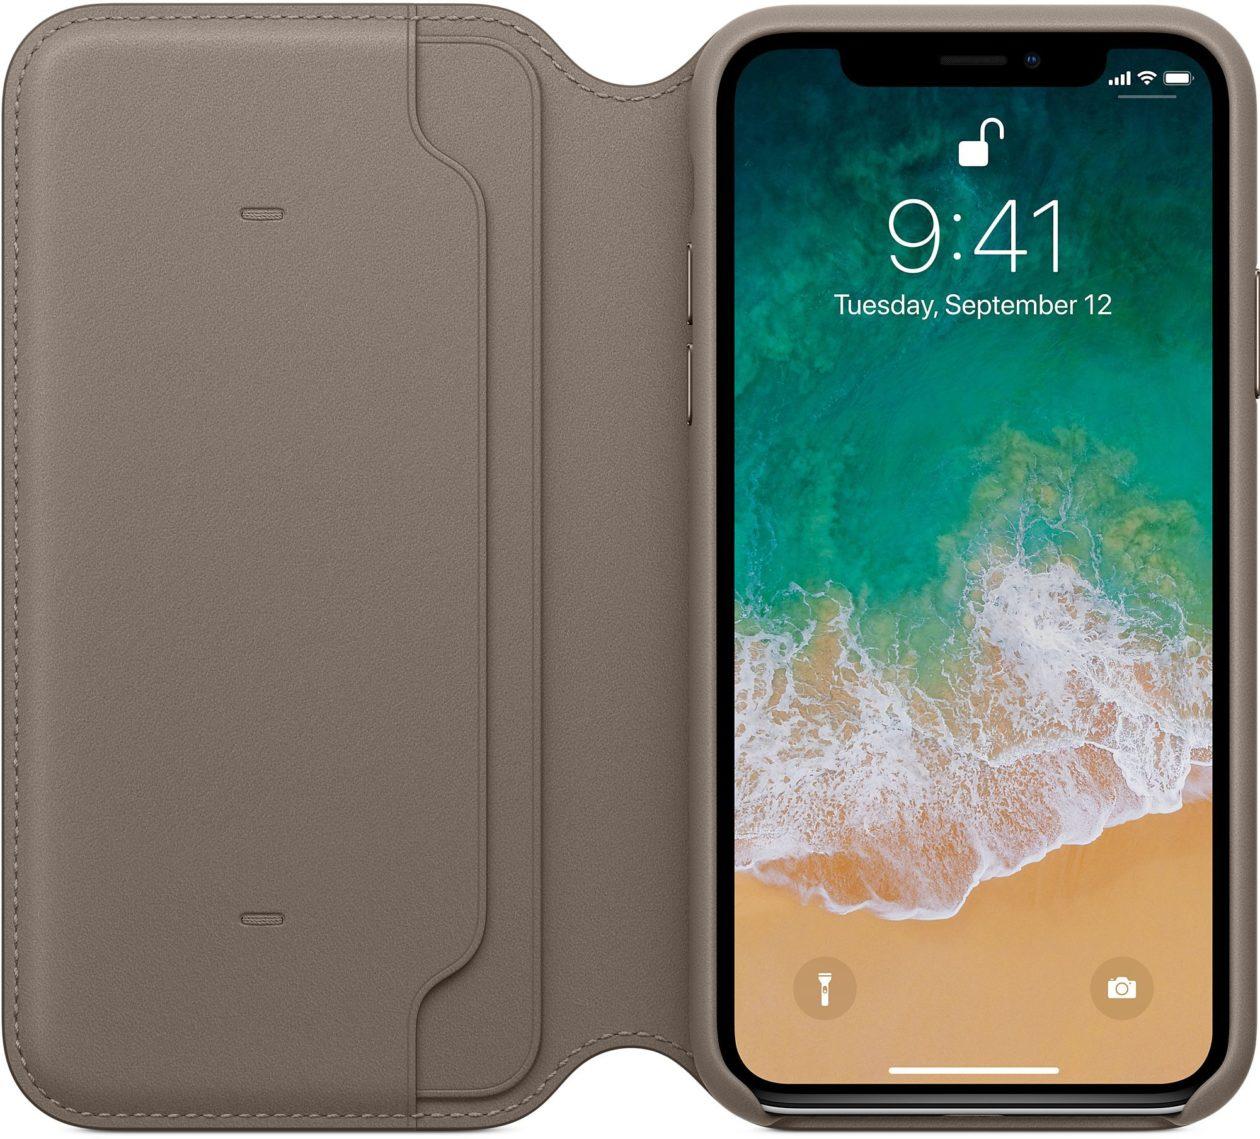 Case Folio do iPhone X de frente, aberta